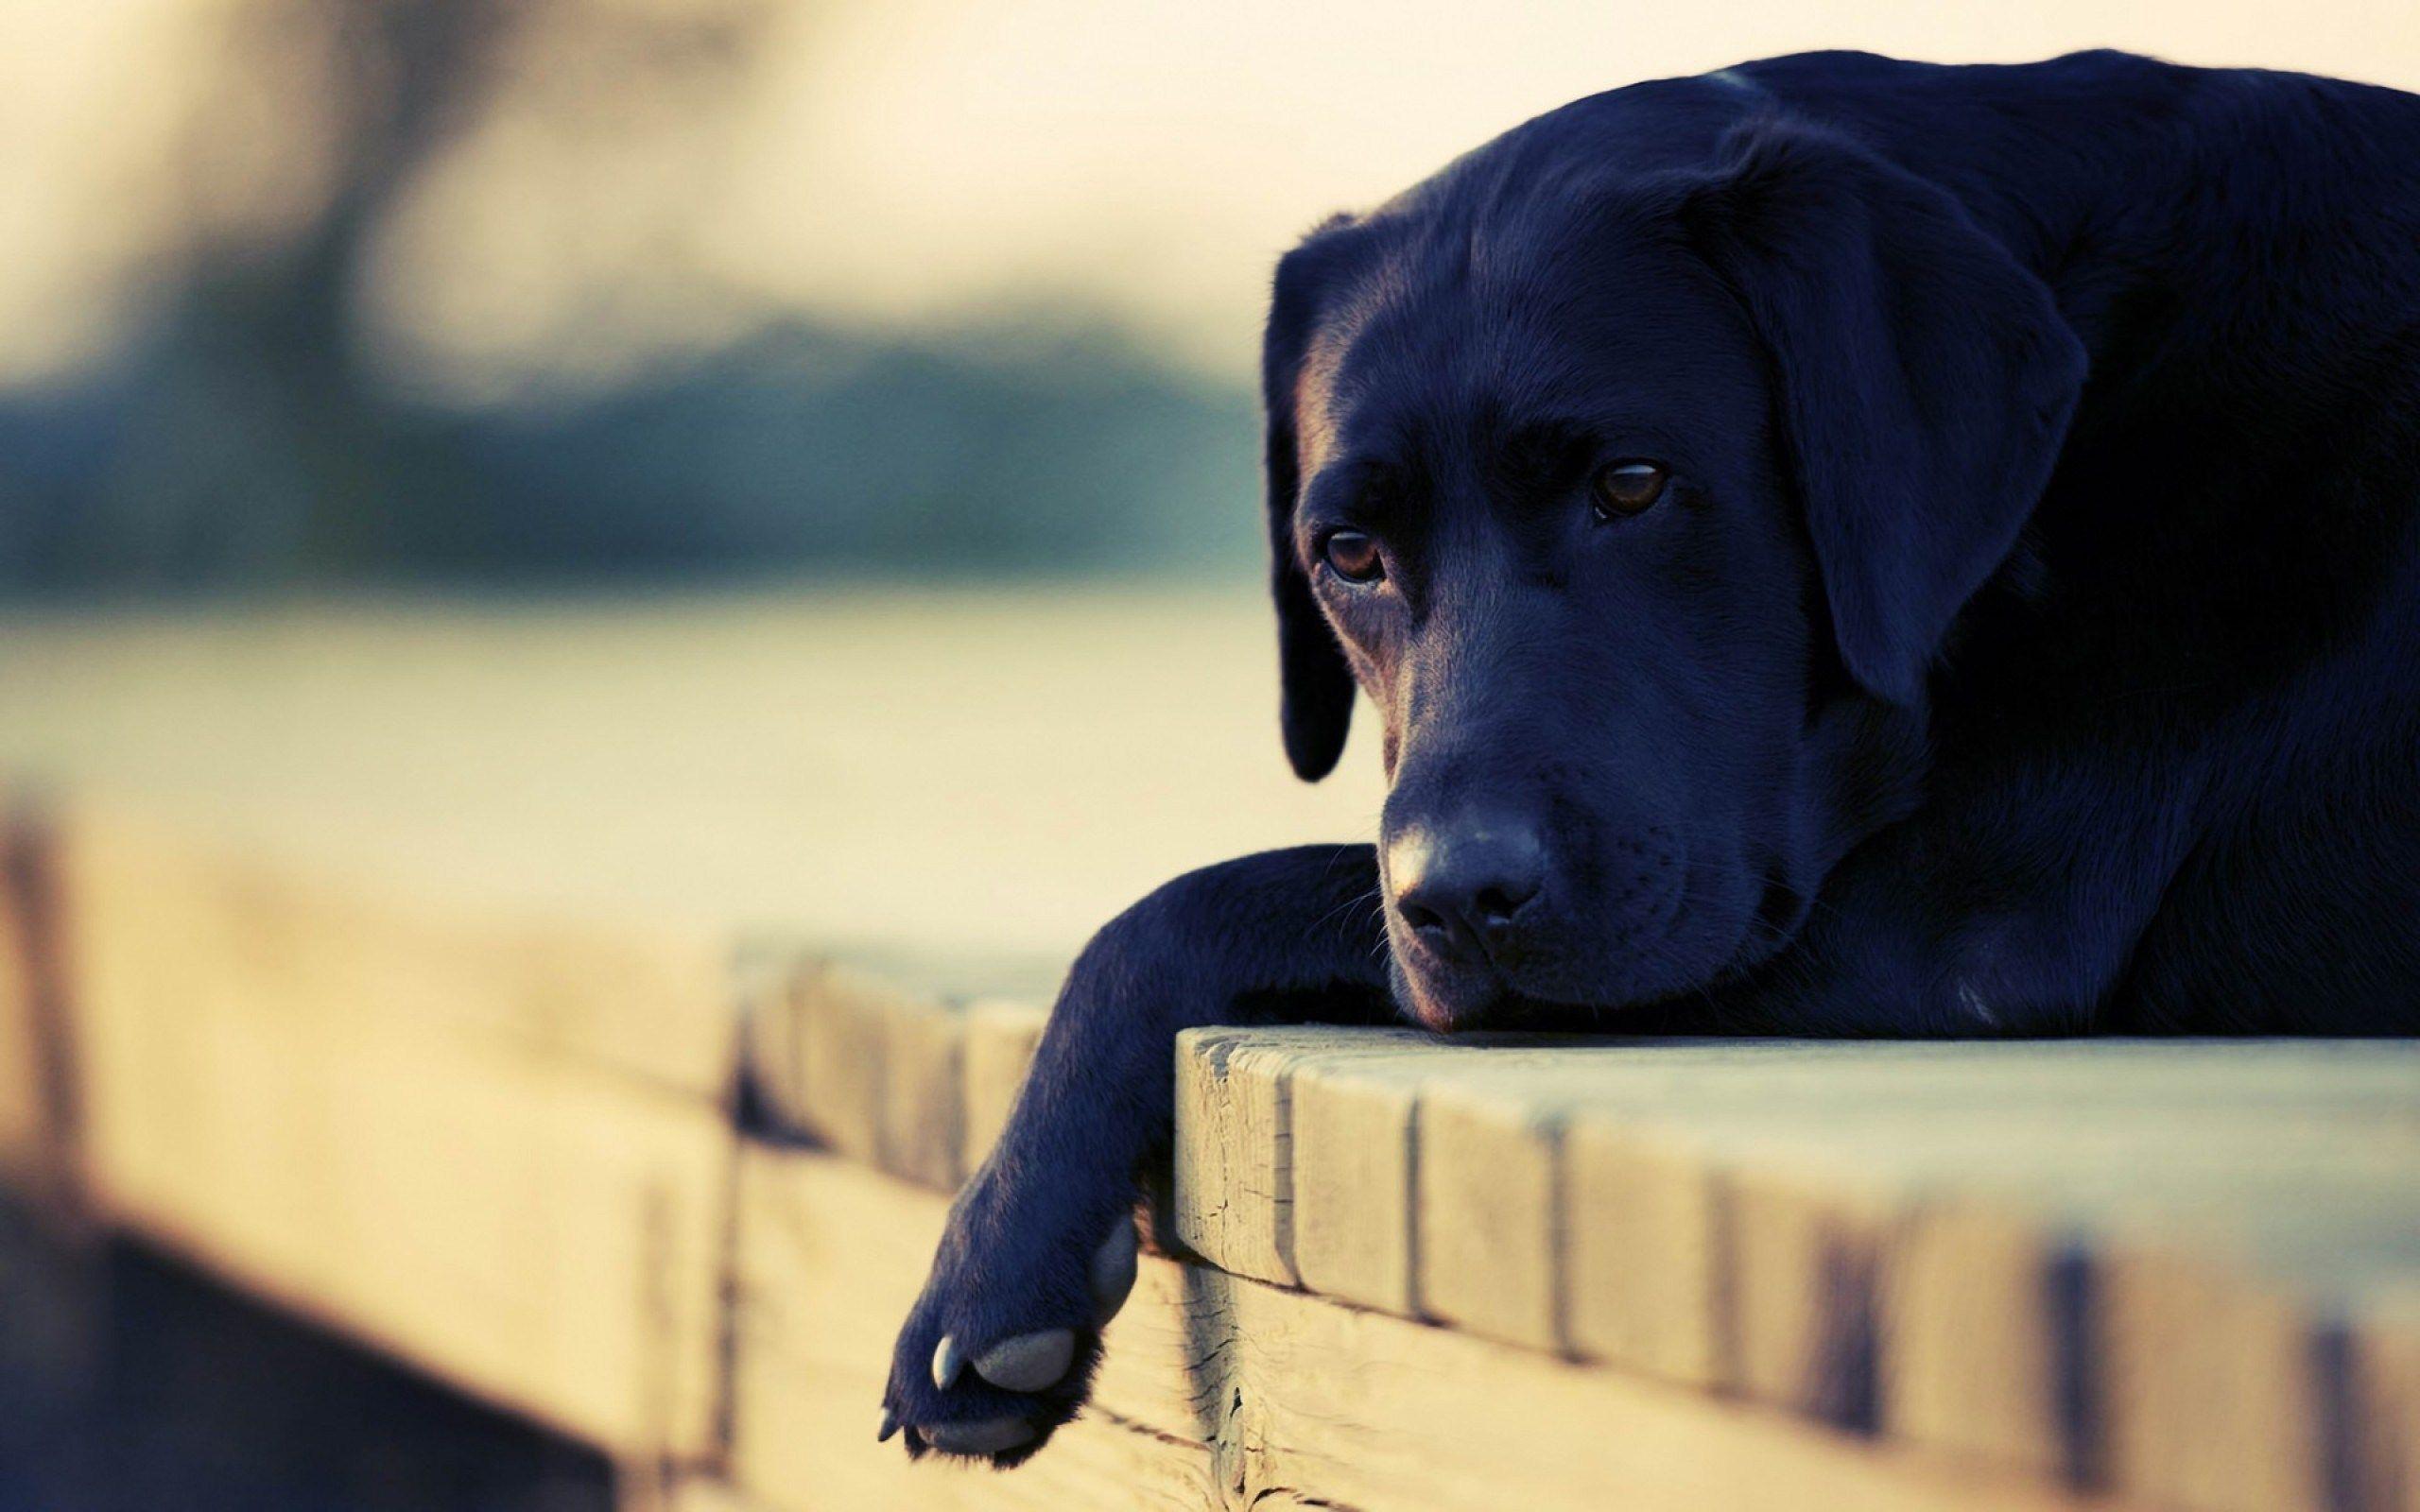 Co Bonito Wallpaper Hd Pgina 3 Do 3 Wallpaperwiki Cute Dog